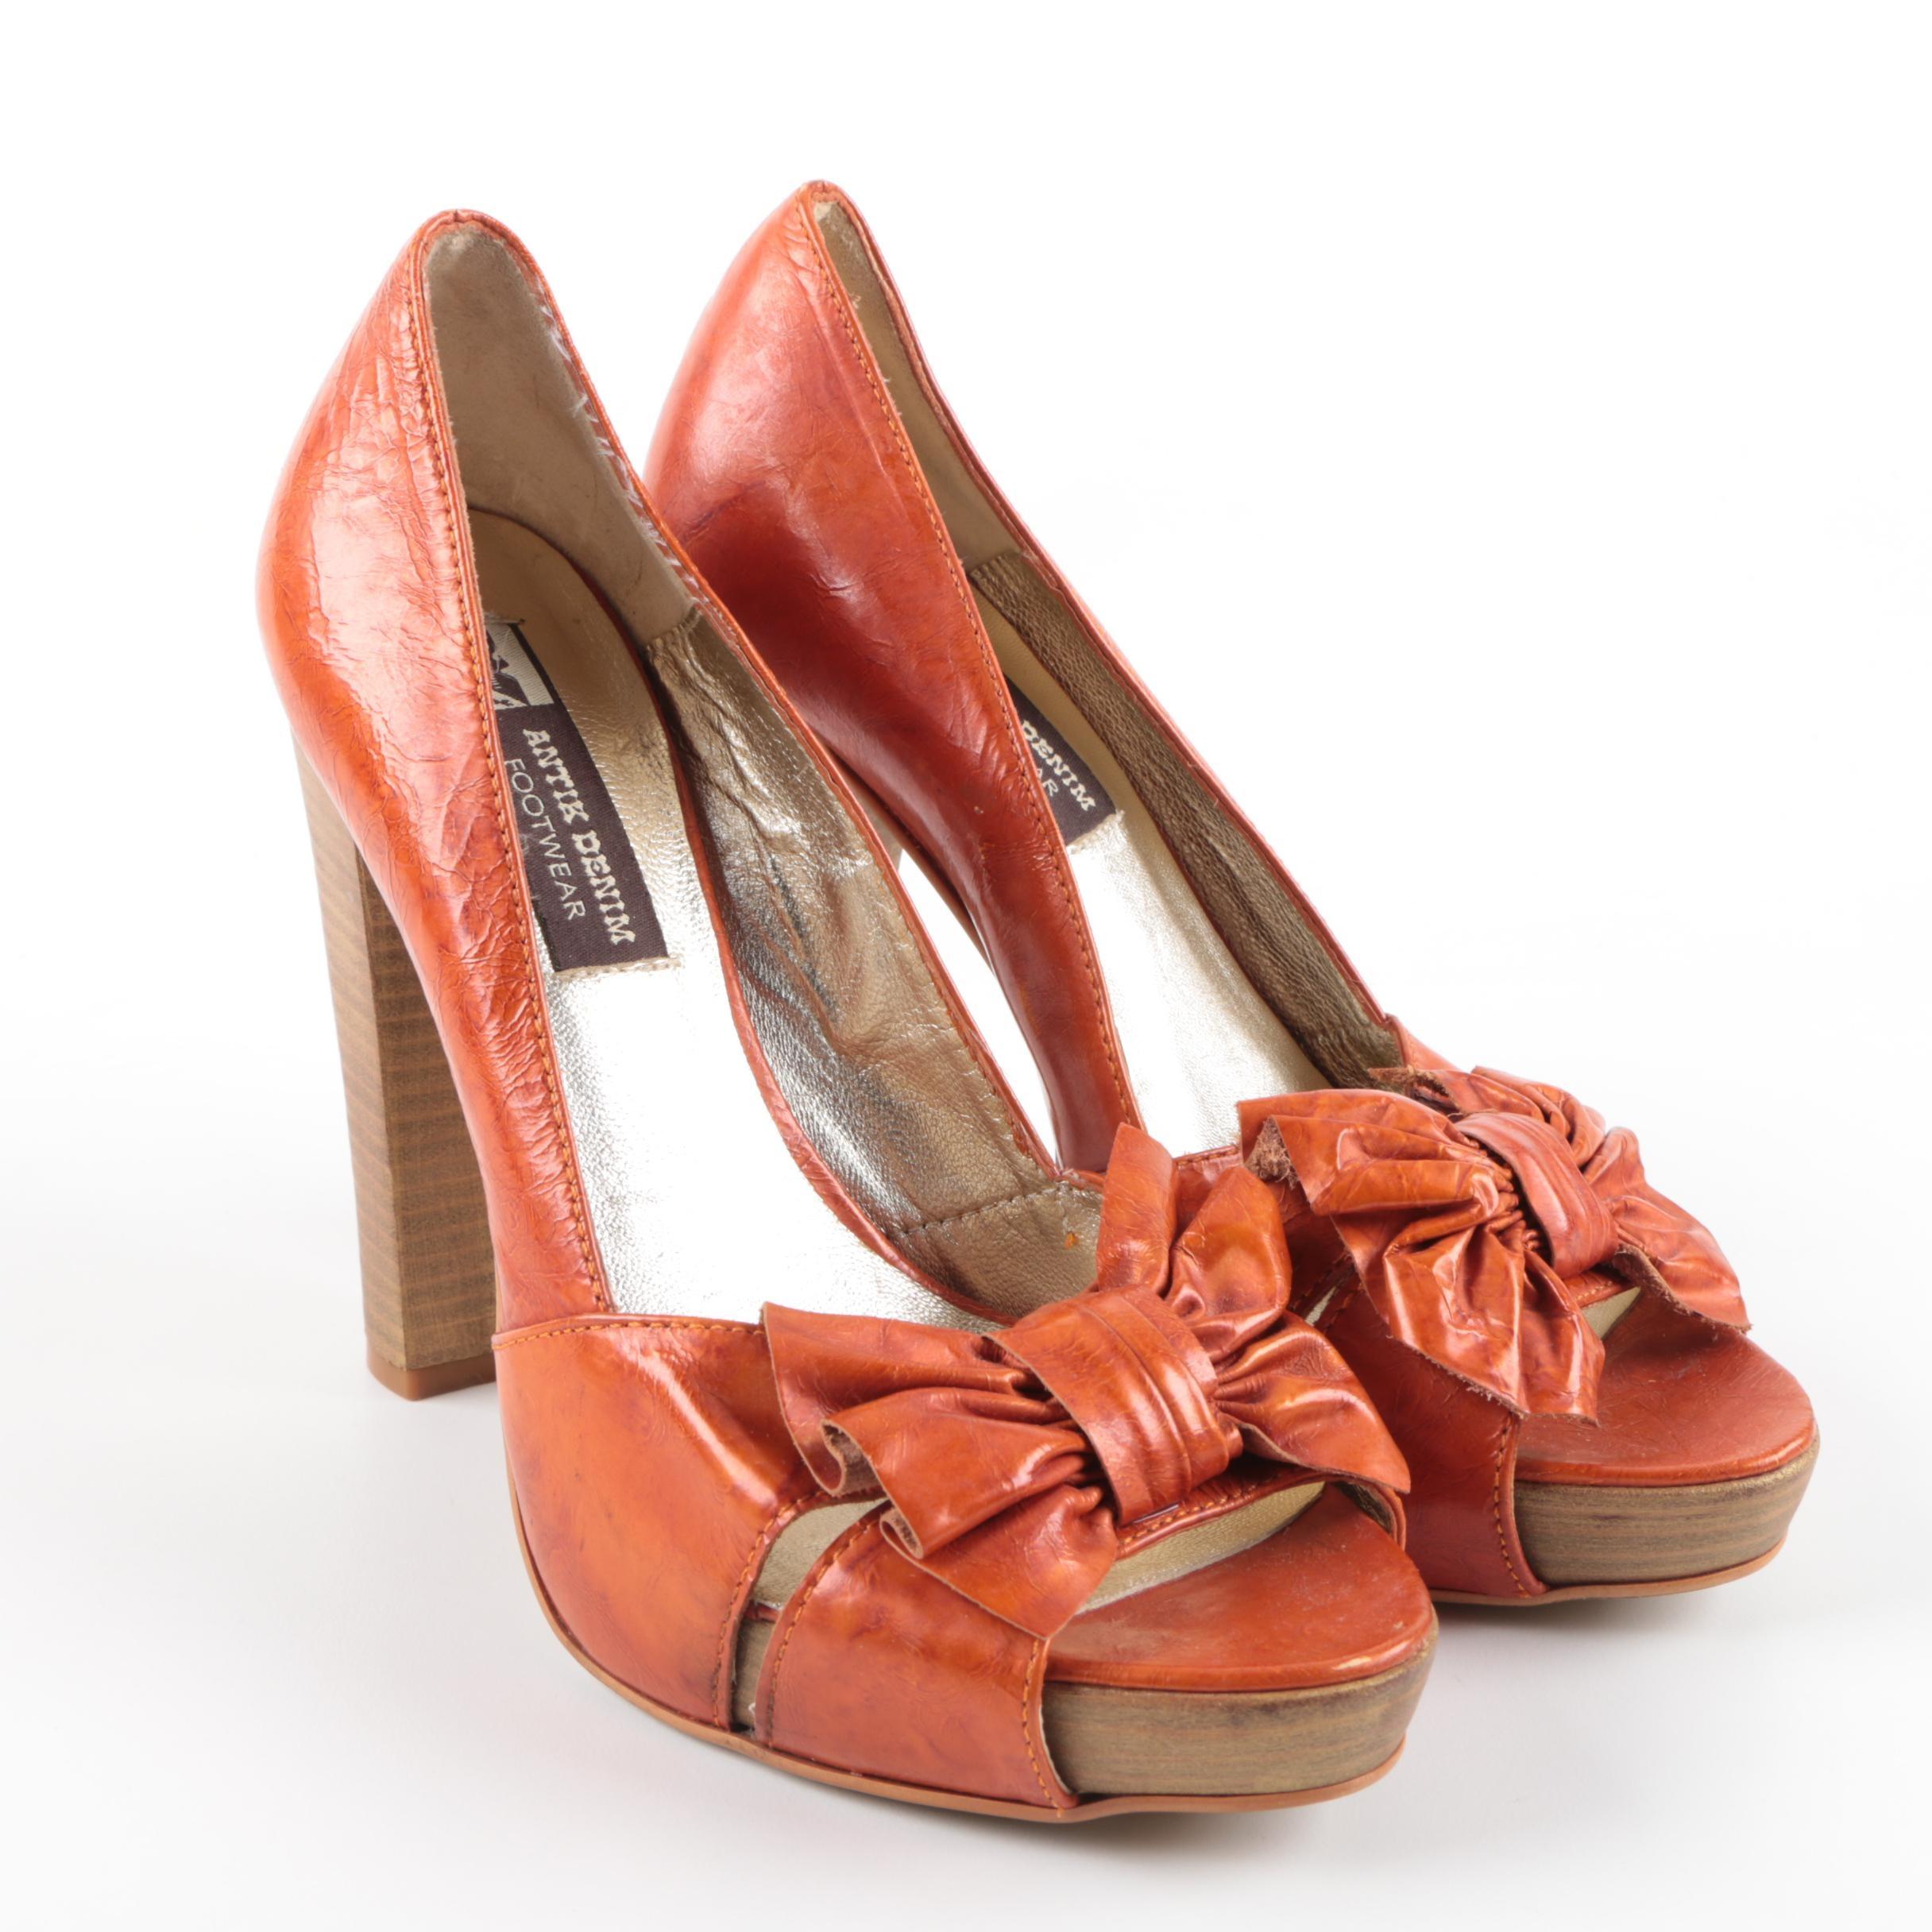 Antik Denim Orange Leather Heels